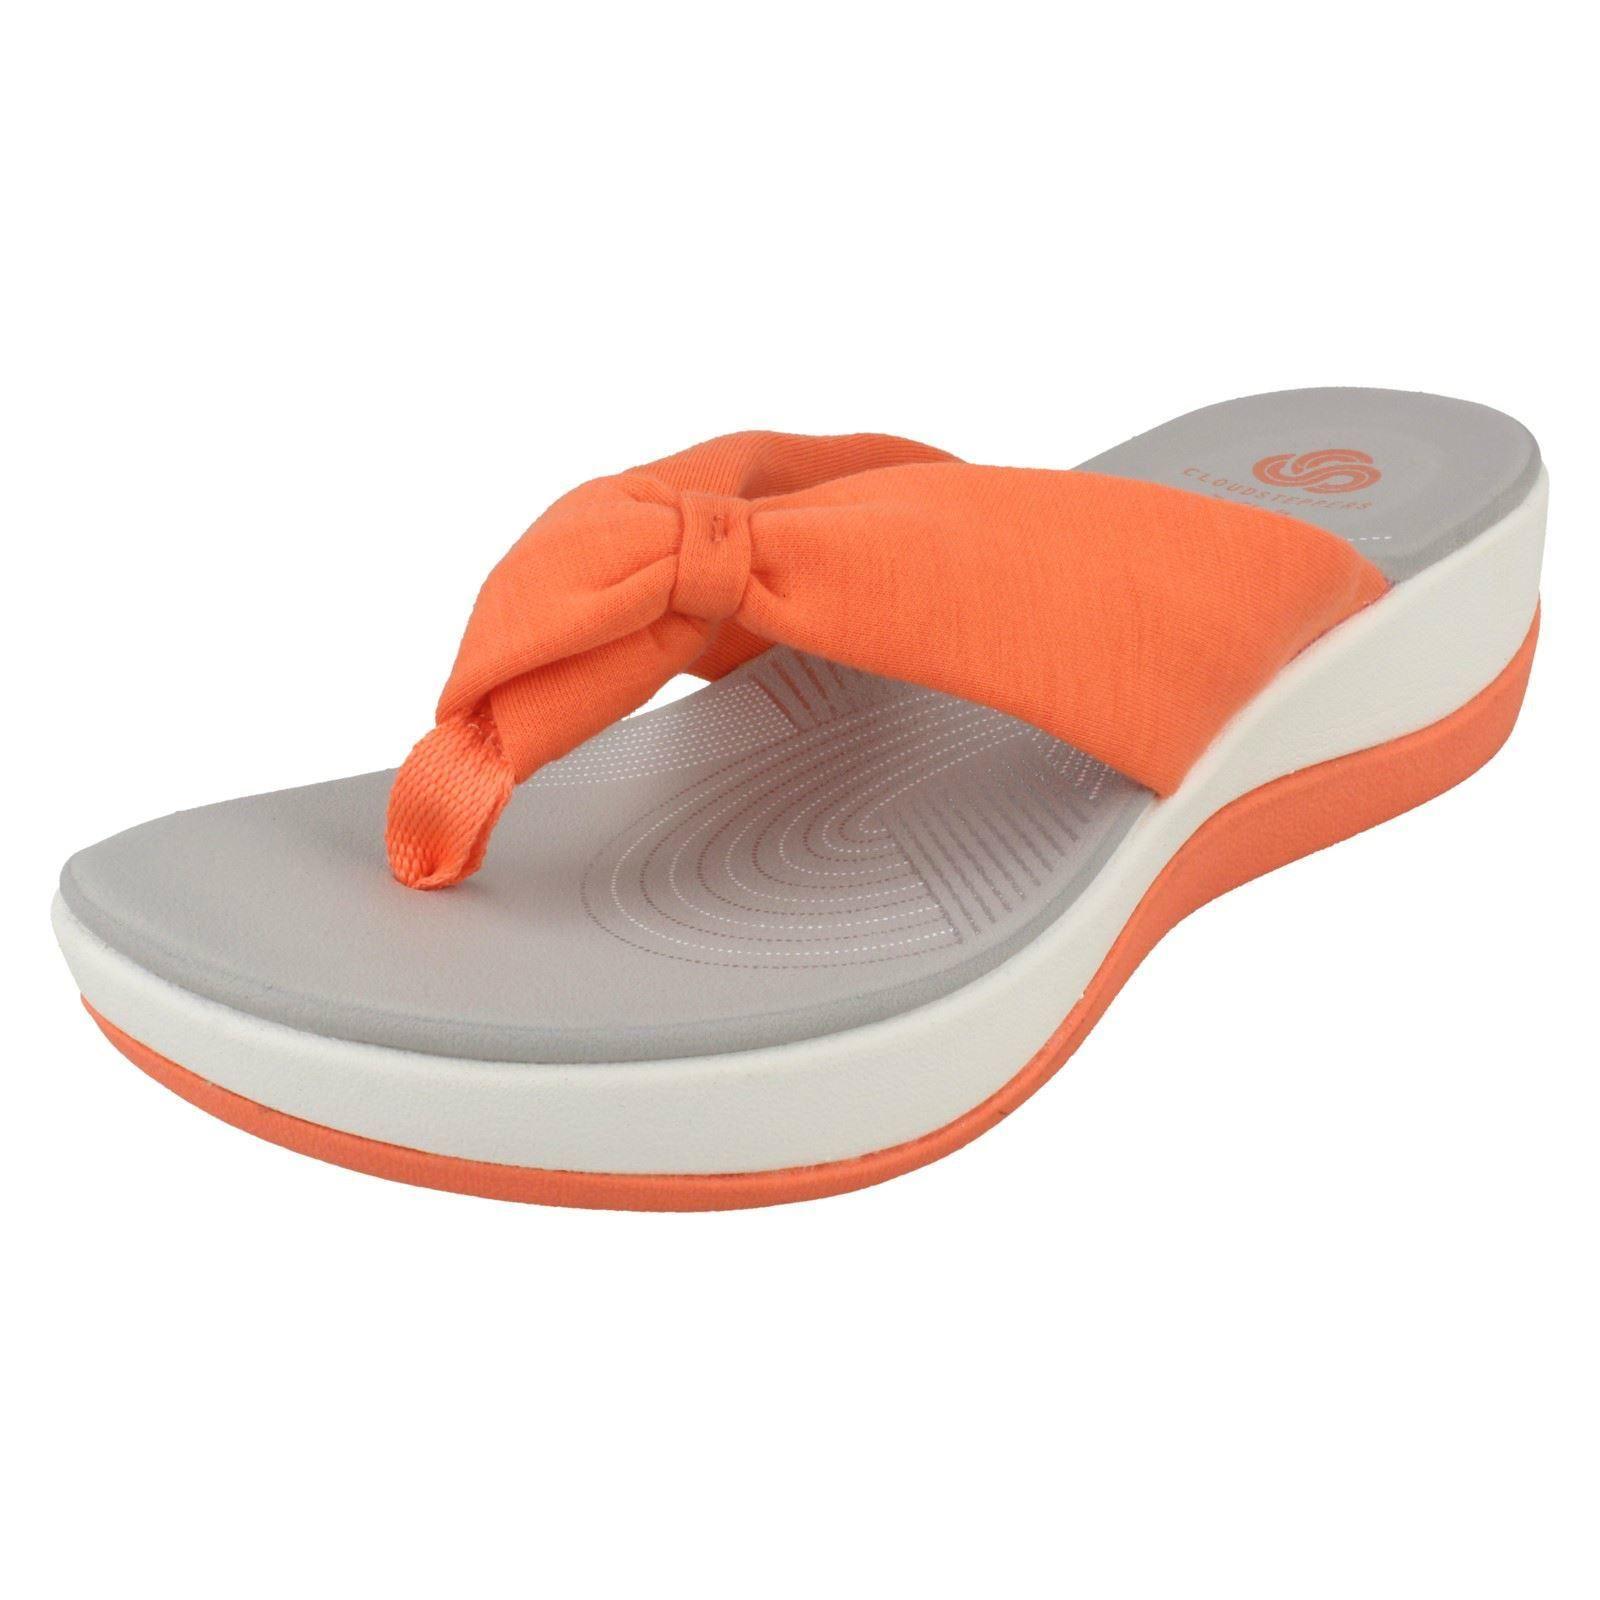 0295dd8a19de Ladies Clarks Cloud Steppers Toe Post Sandals  Arla Glison